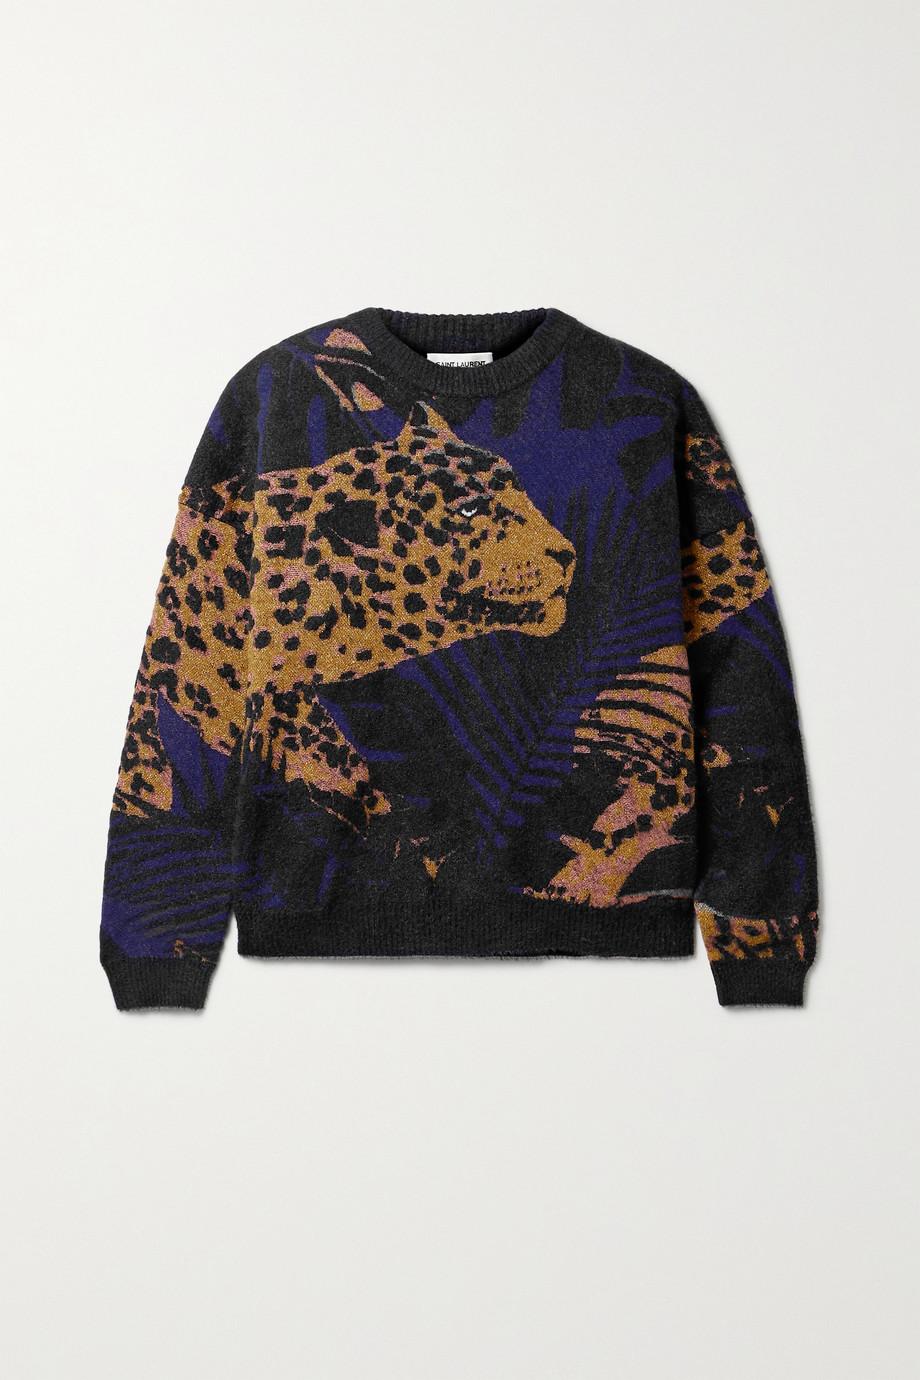 SAINT LAURENT Metallic jacquard-knit sweater